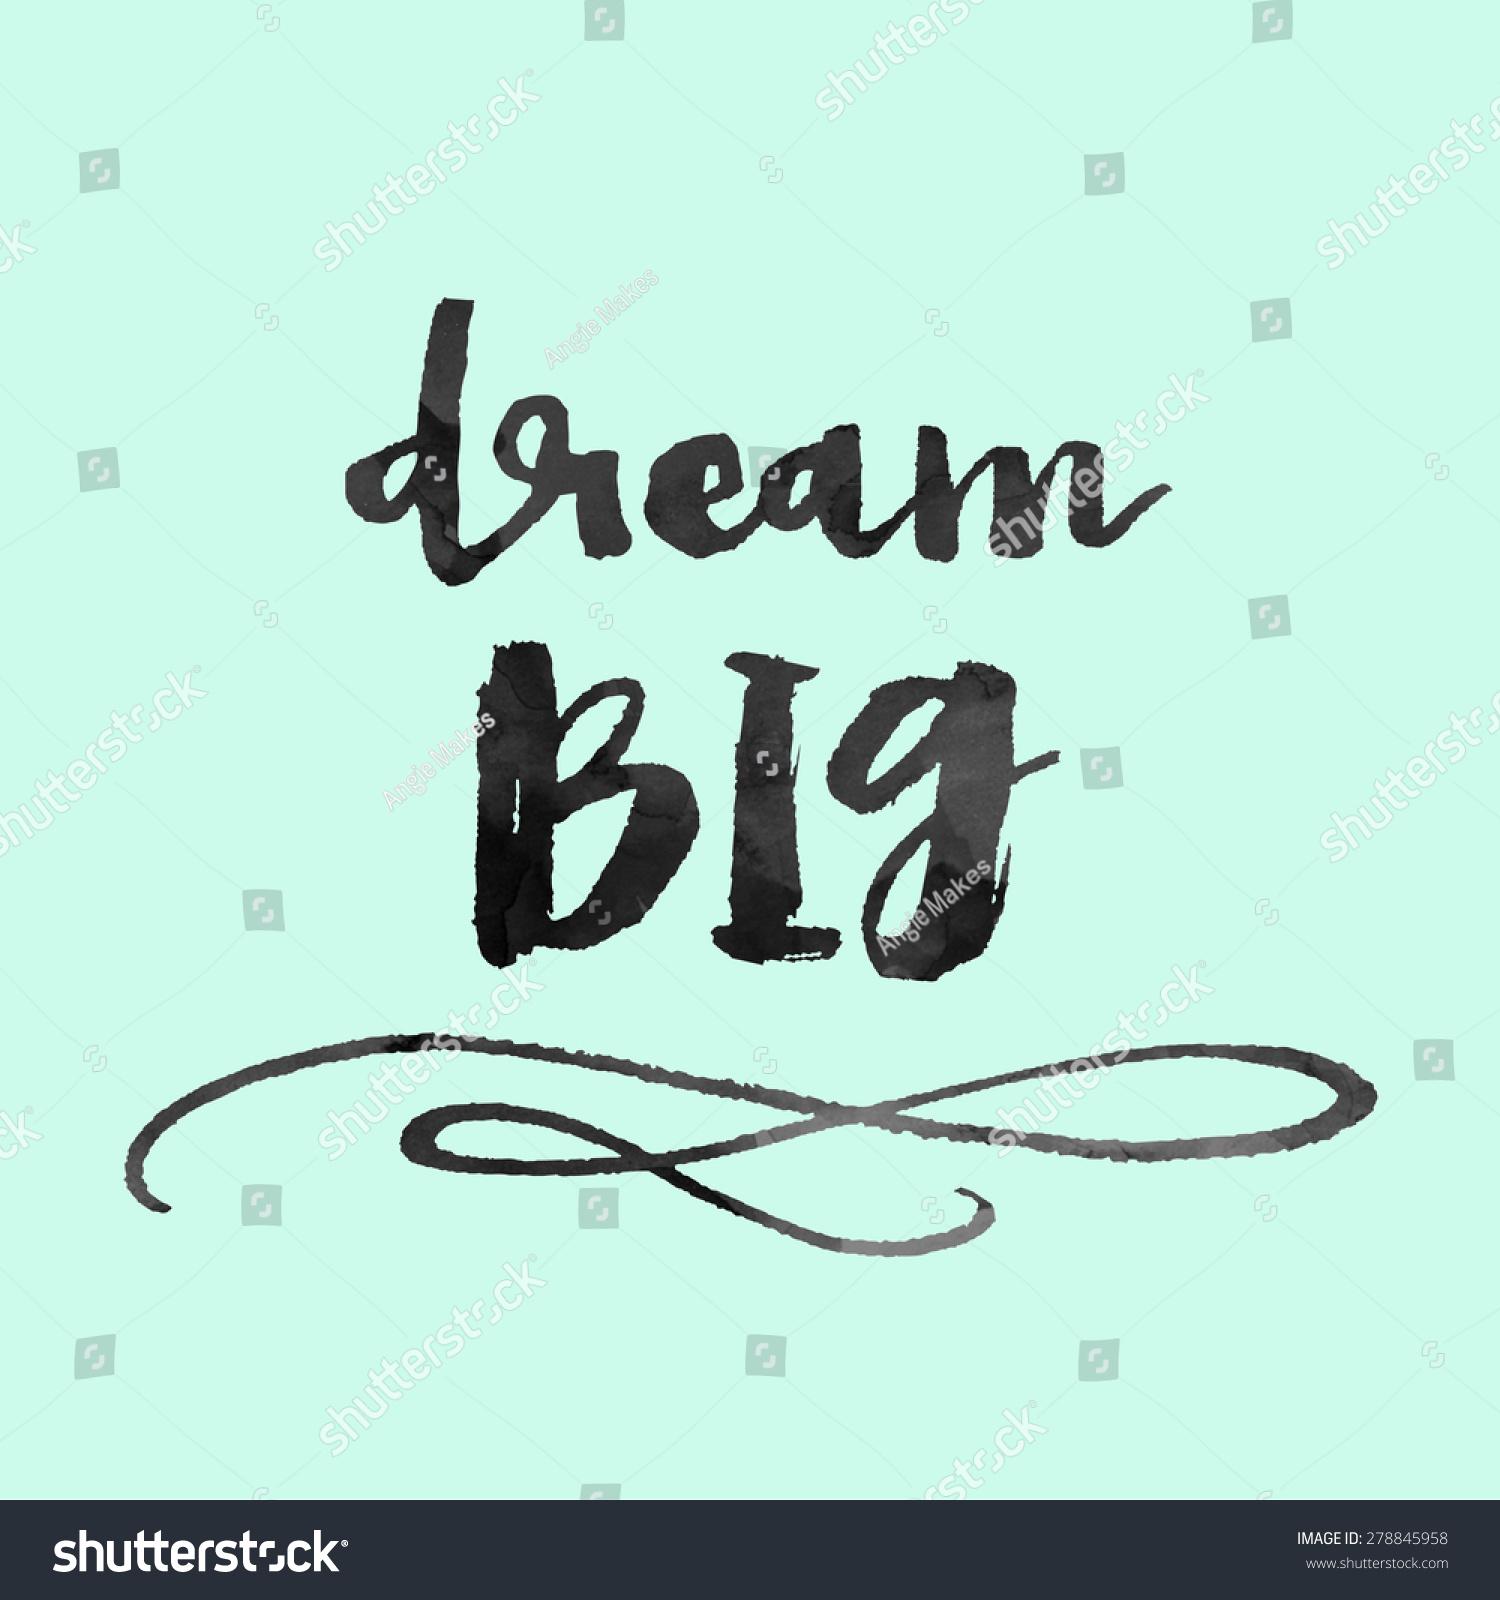 Dream big quote stock illustration